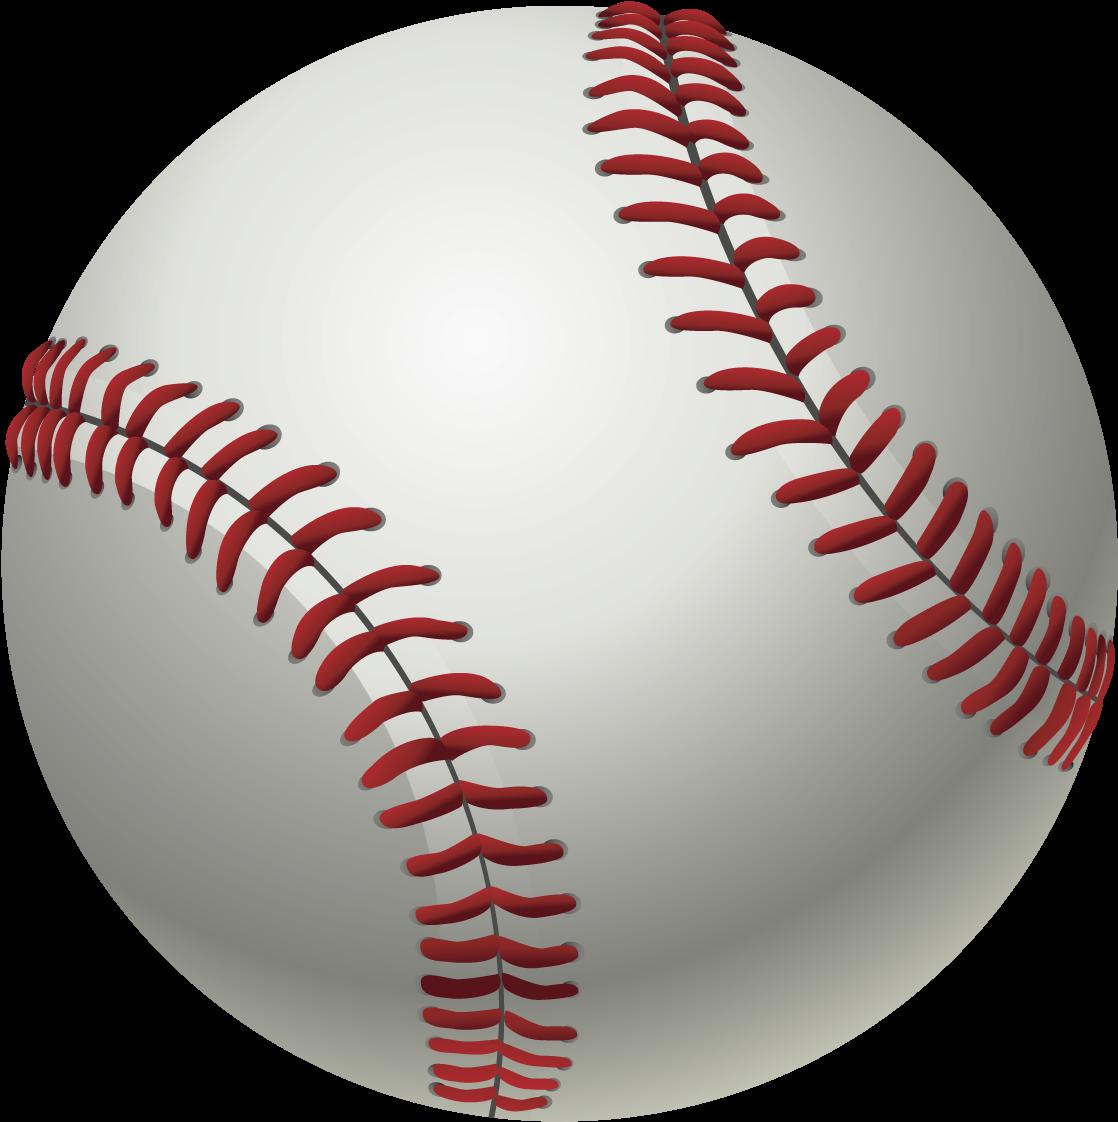 Free Baseball Transparent Background, Download Free Clip Art.